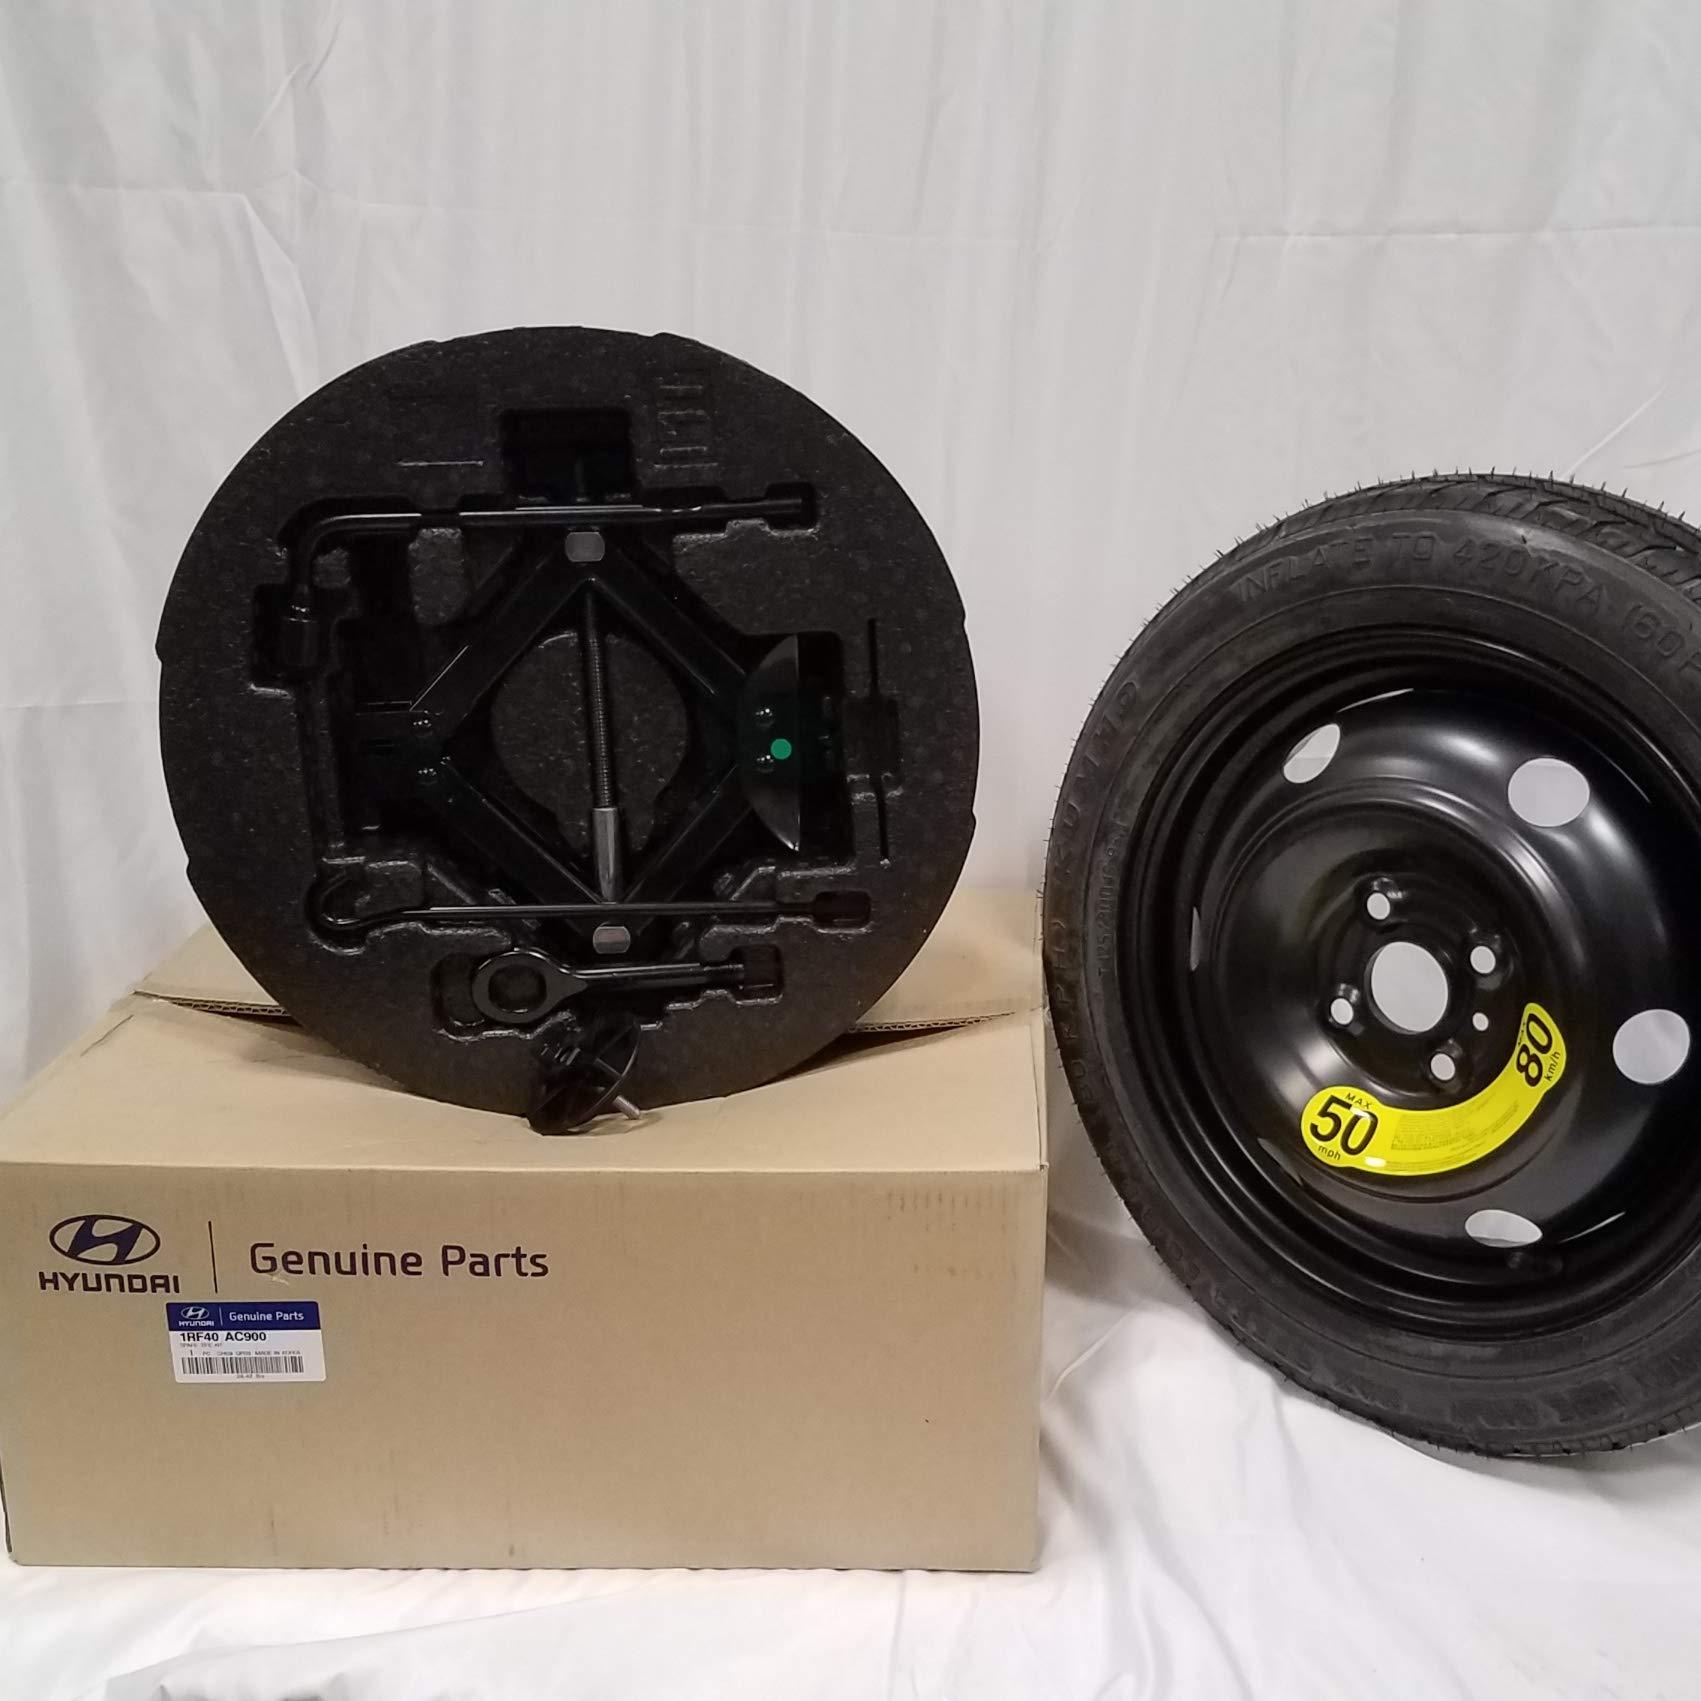 HYUNDAI Genuine 1RF40-AC900 Spare Tire Kit by HYUNDAI